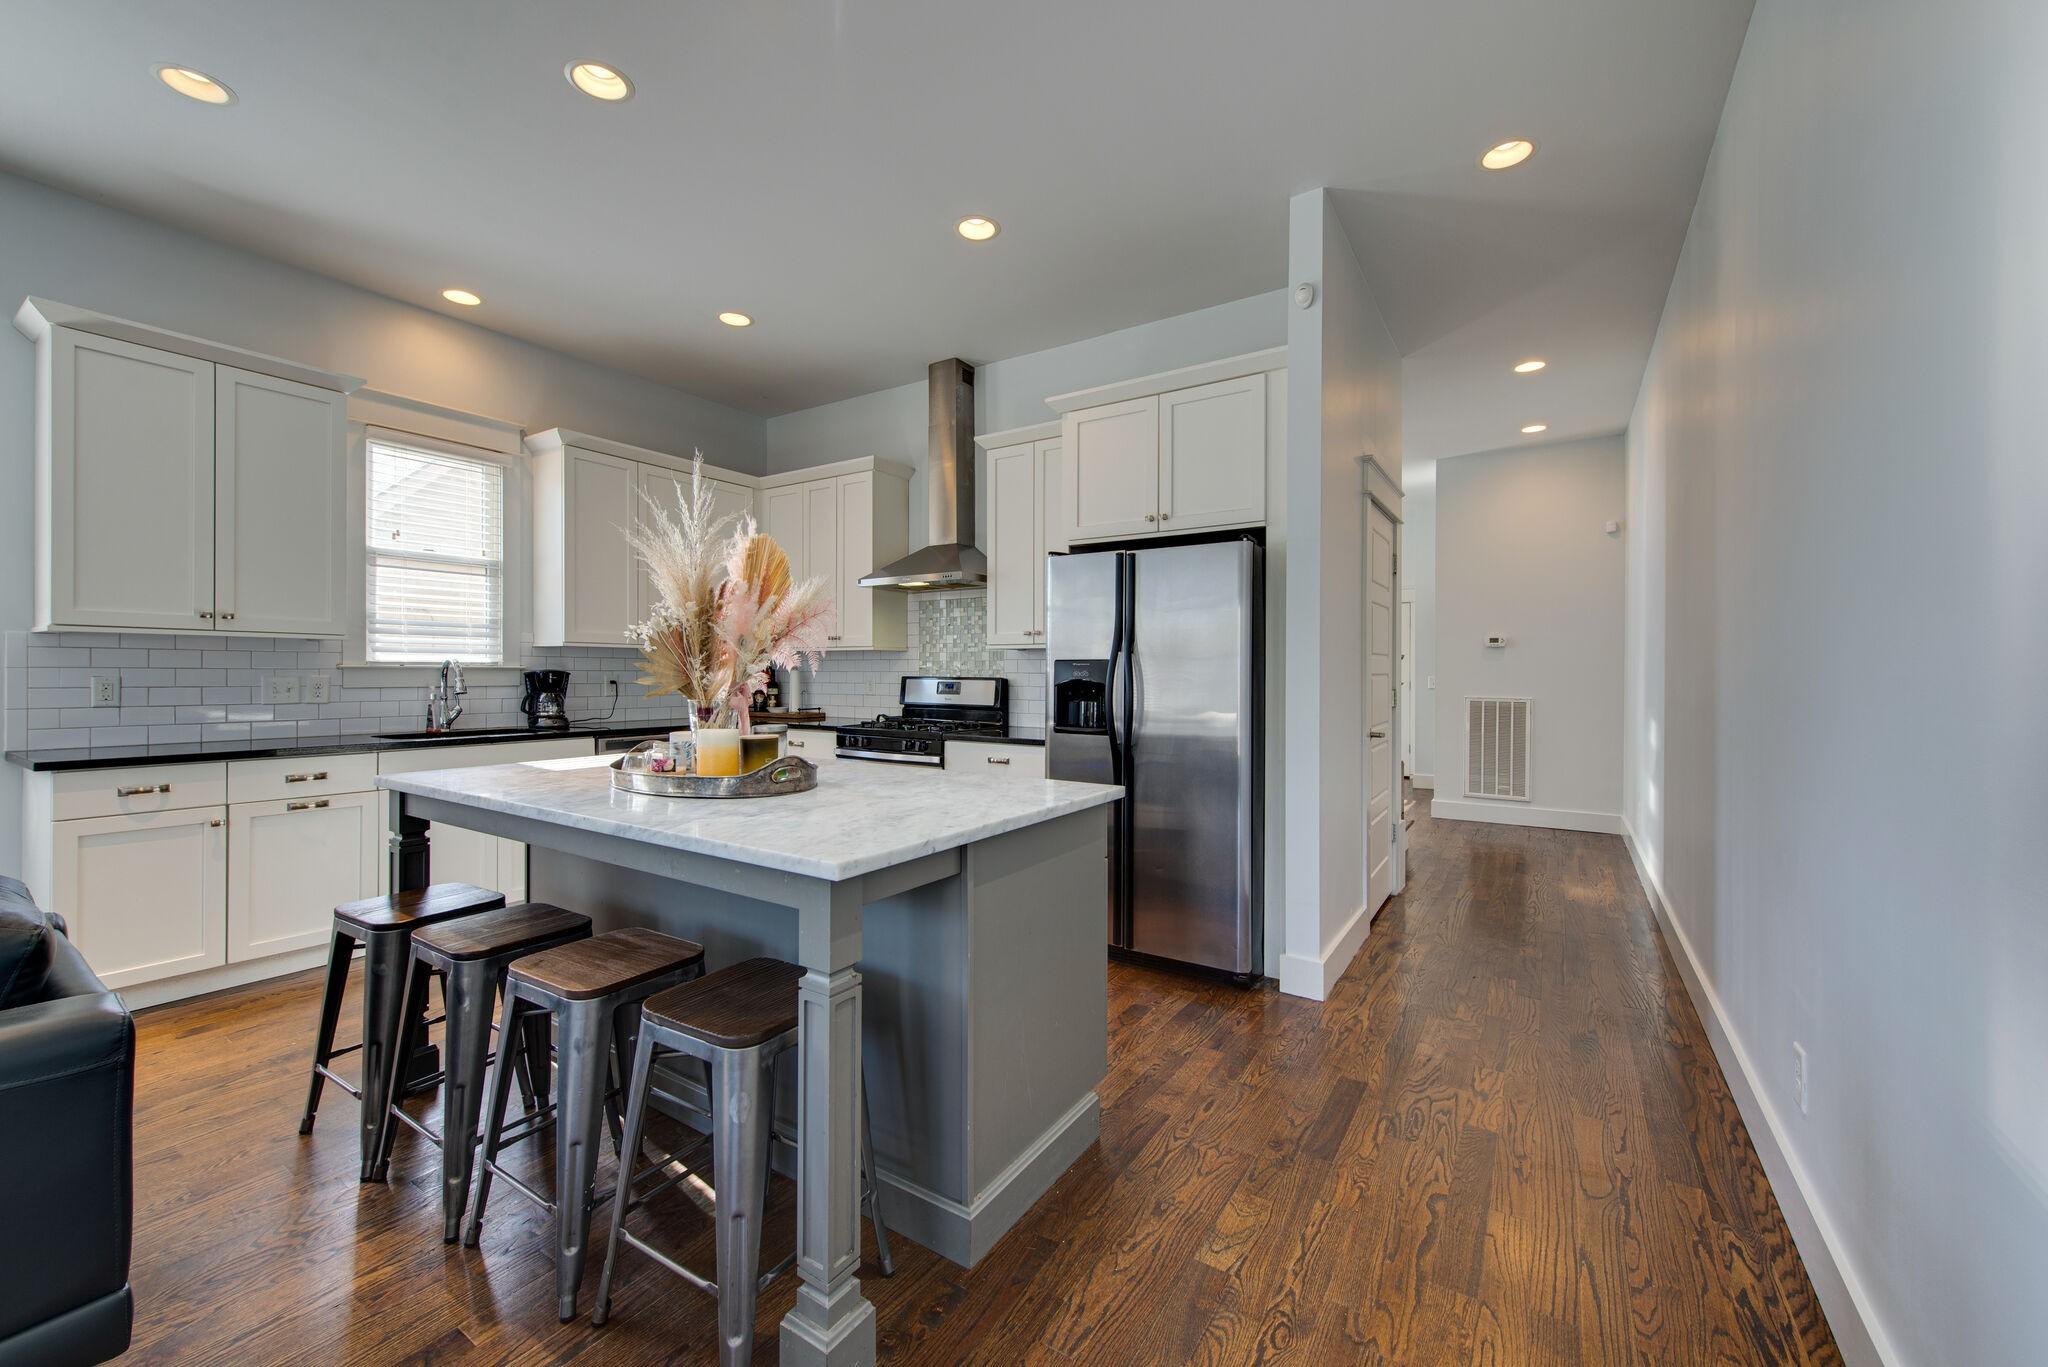 614 Shelby Ave #A Property Photo - Nashville, TN real estate listing